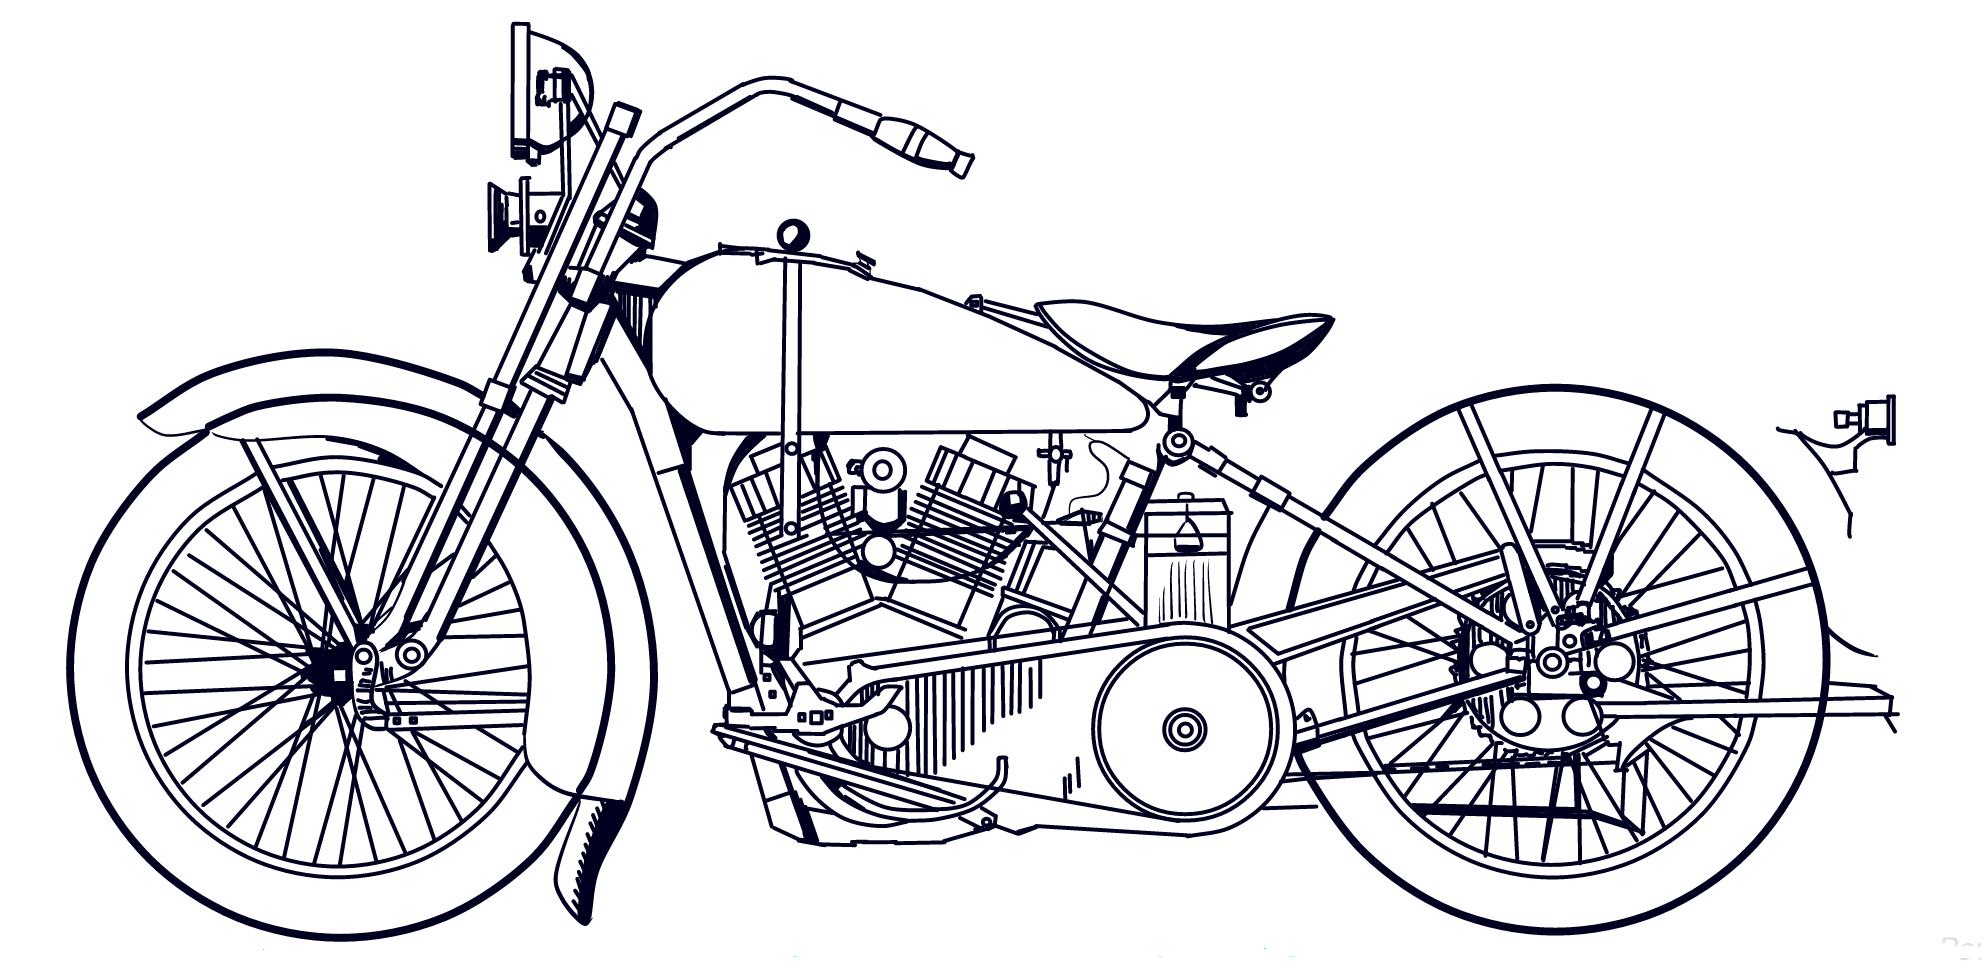 Harley davidson drawing